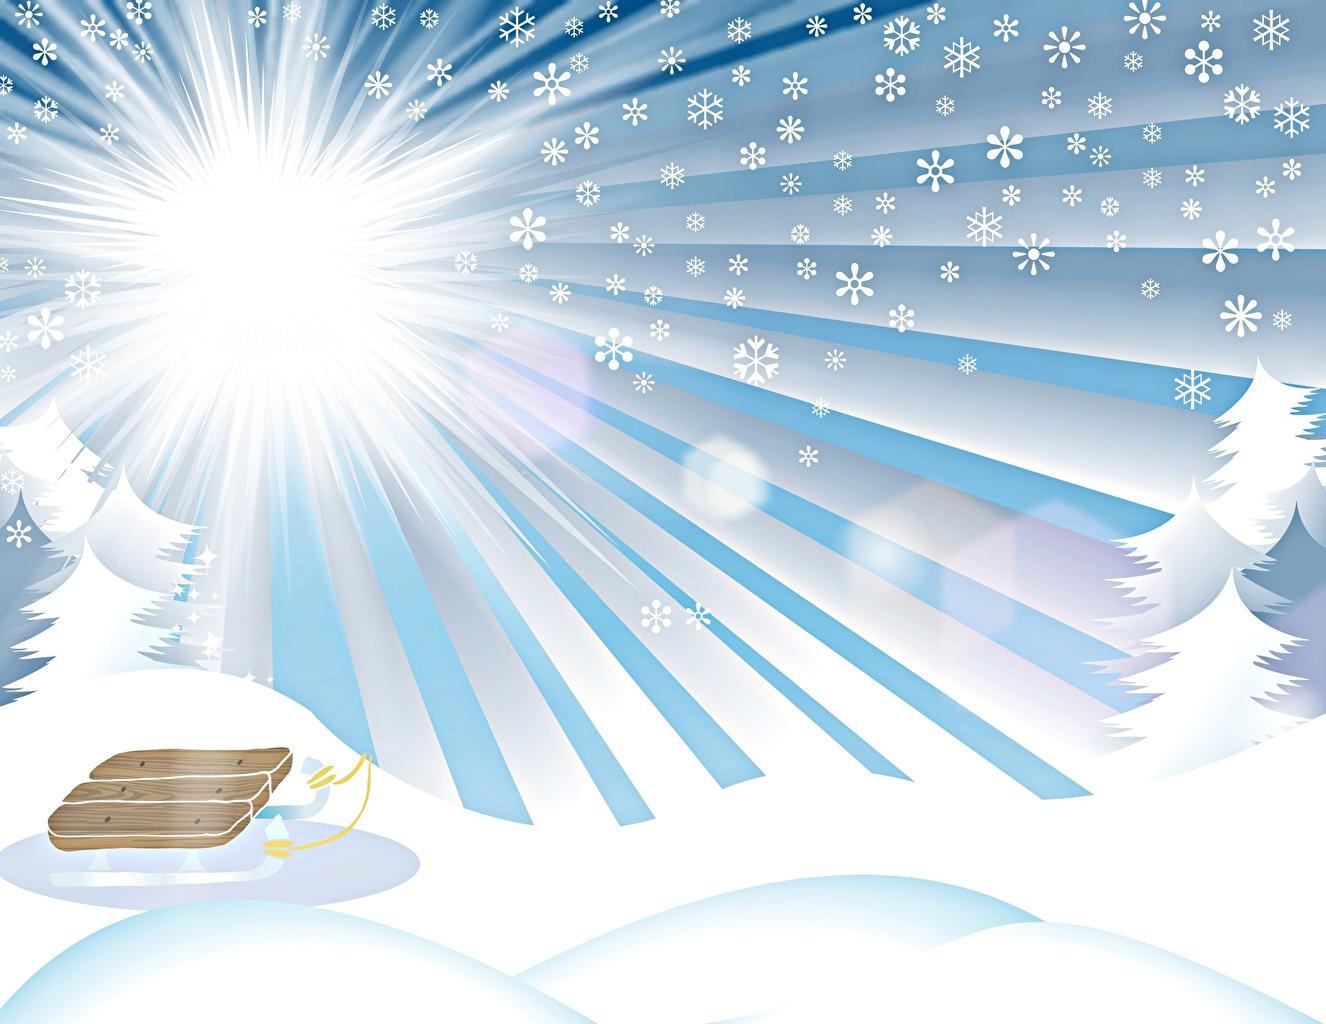 Картинки Лучи света Санки зимние солнца Природа снежинка Снег Векторная графика Сани санях санках Зима Солнце Снежинки снеге снегу снега